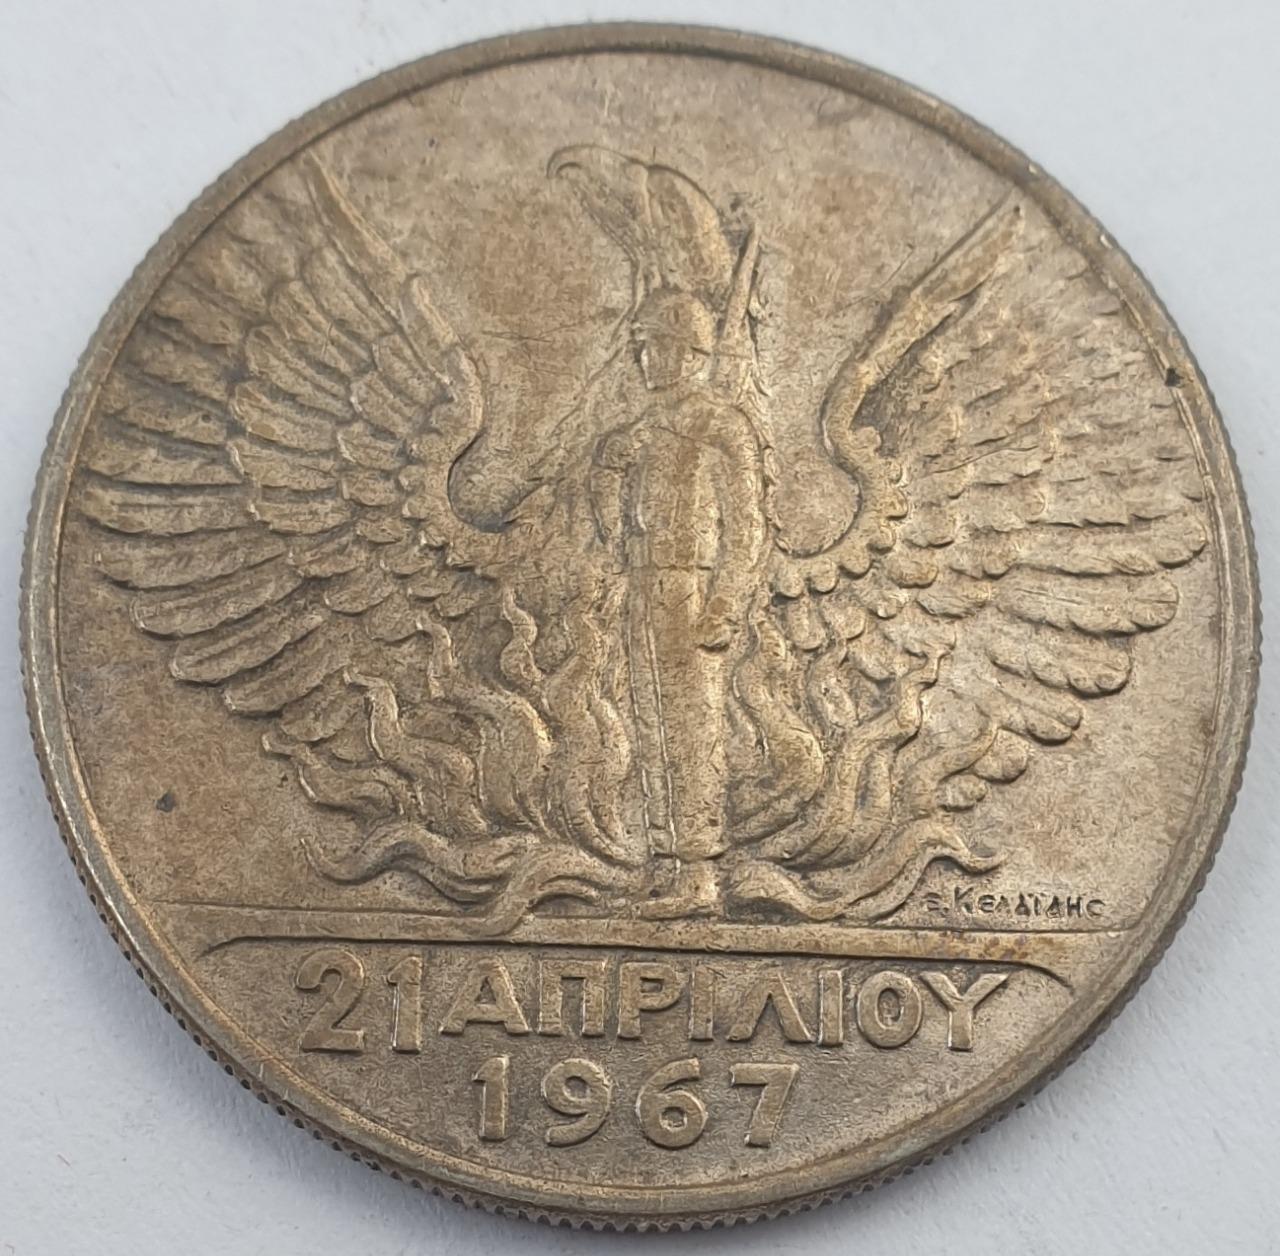 Greece - 50 Drachmas 1967, Constantine II, Silver